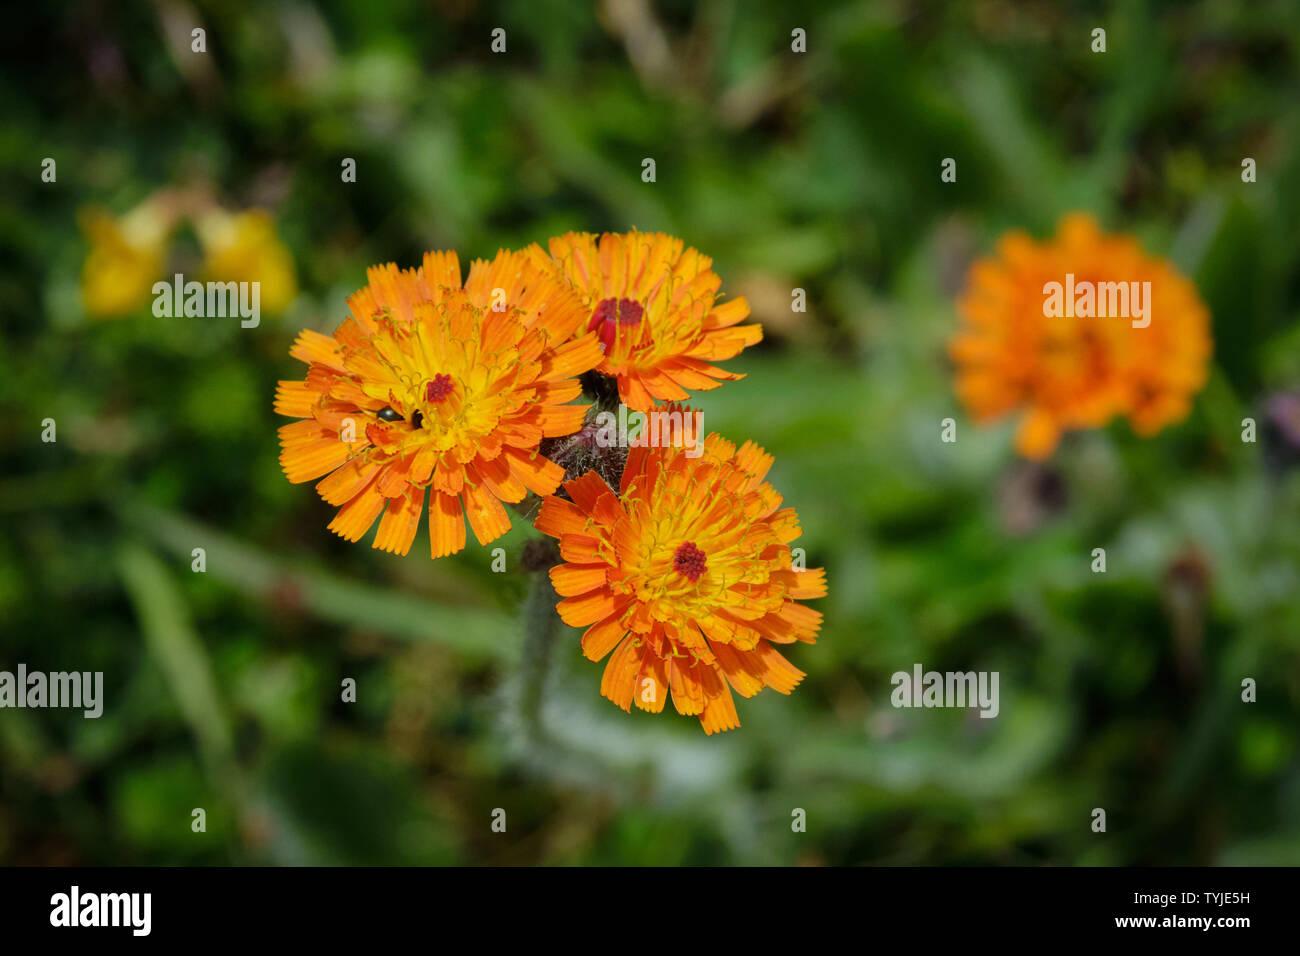 Orange Hawkweed (Pilosella Aurantica) Growing In A Former Quarry Site - Stock Image